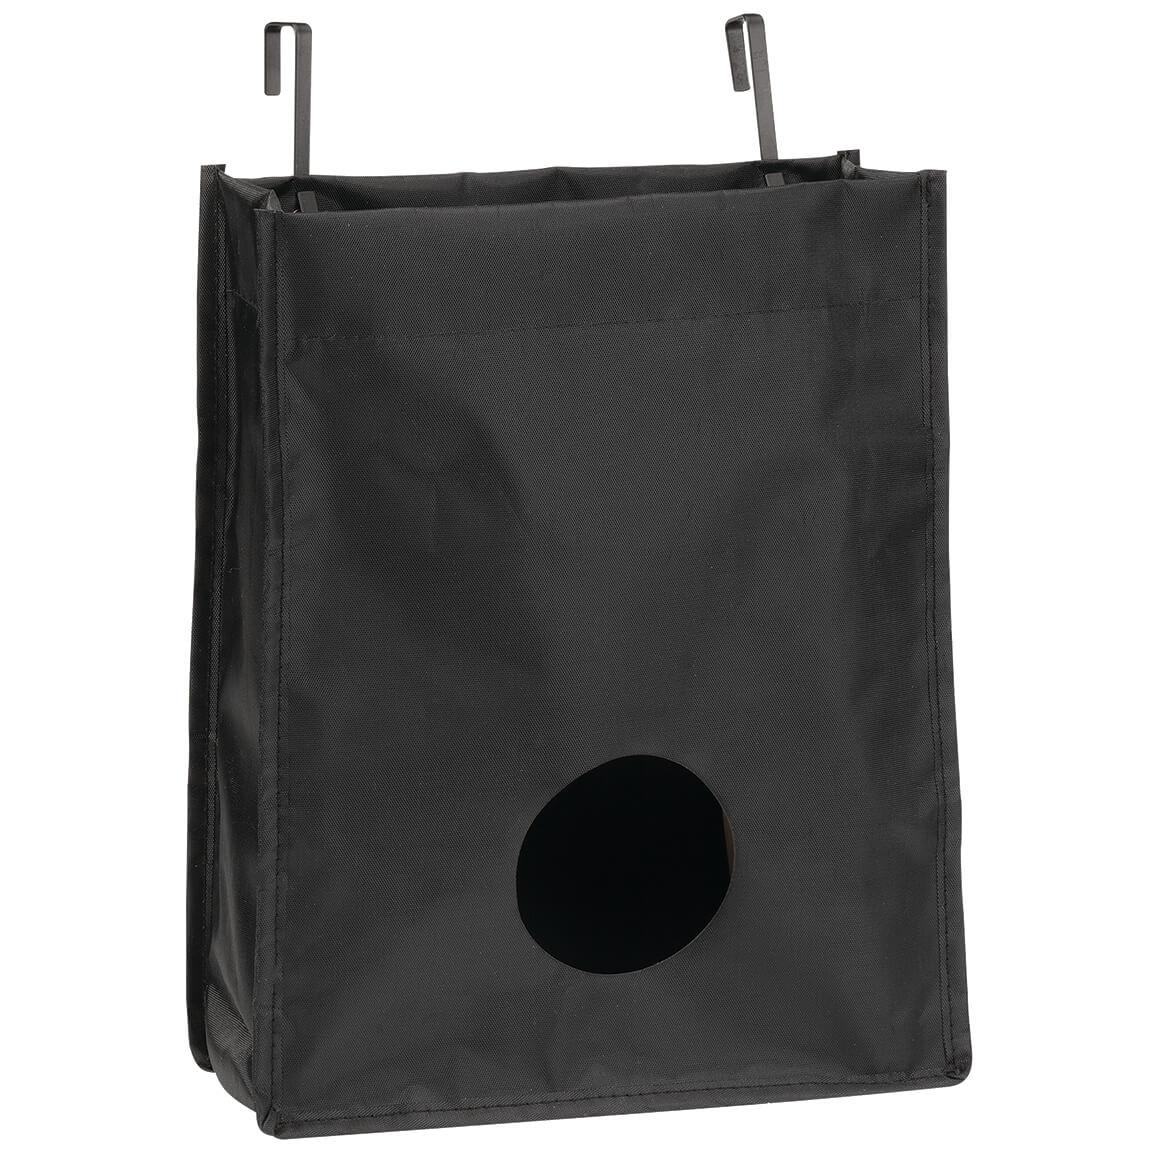 Over the Cabinet Plastic Bag Holder-371124